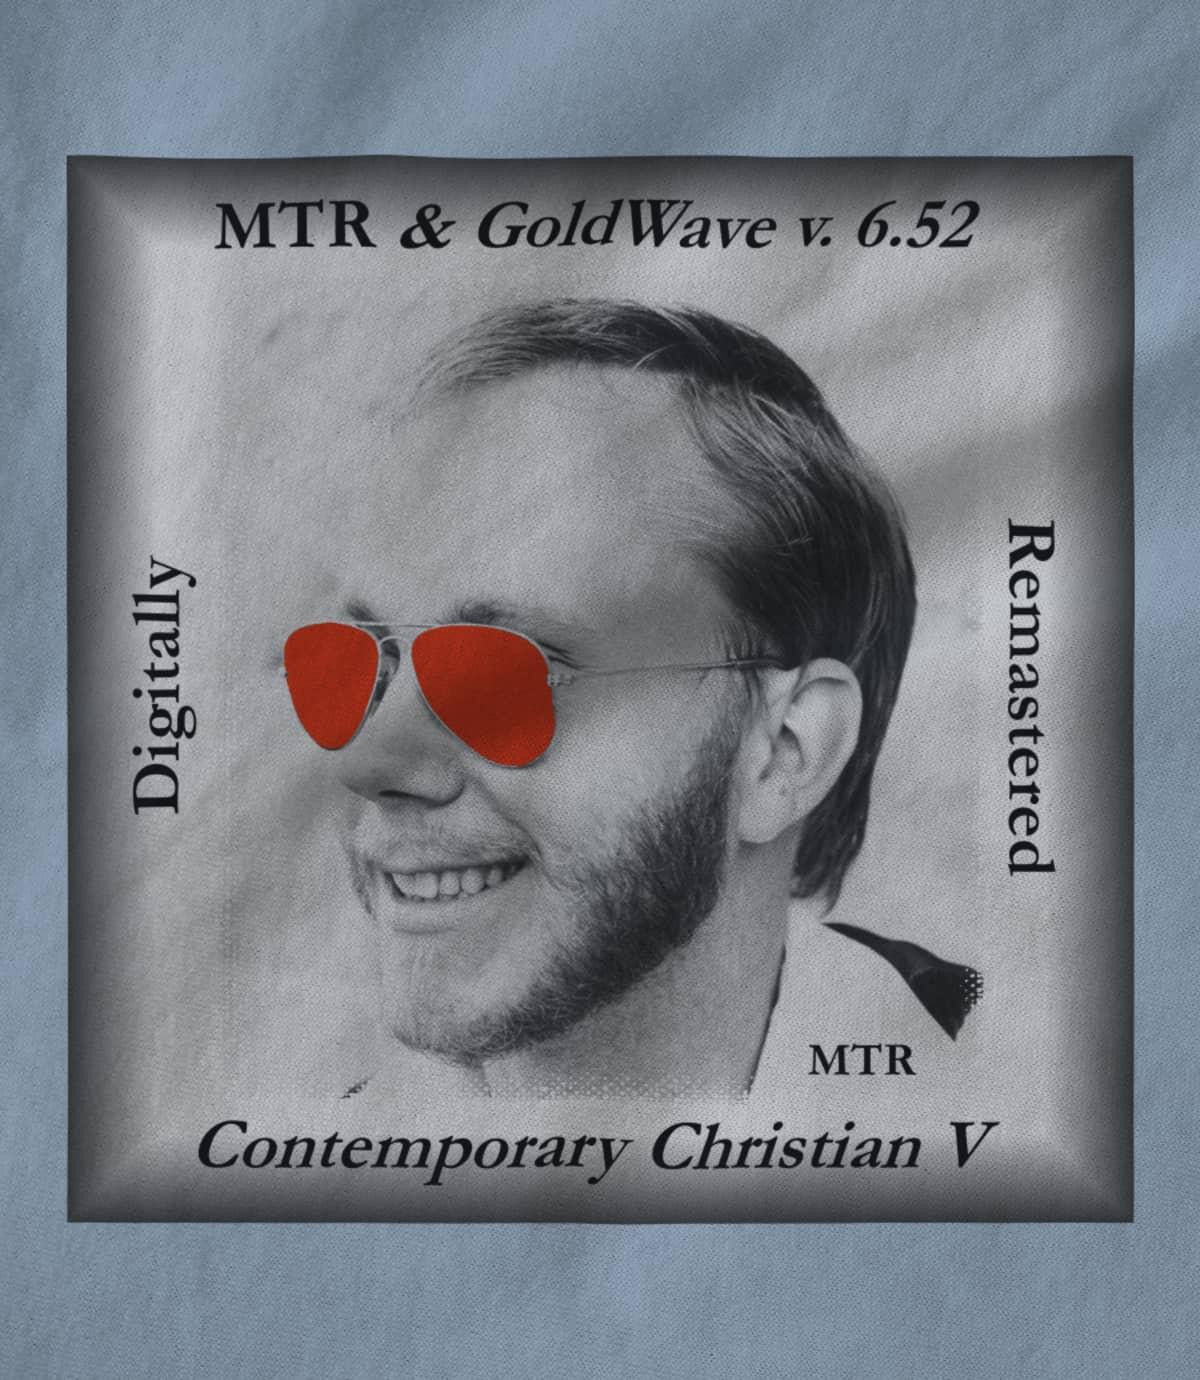 Michael resch  contemporary christian v  3d album art 1607801615